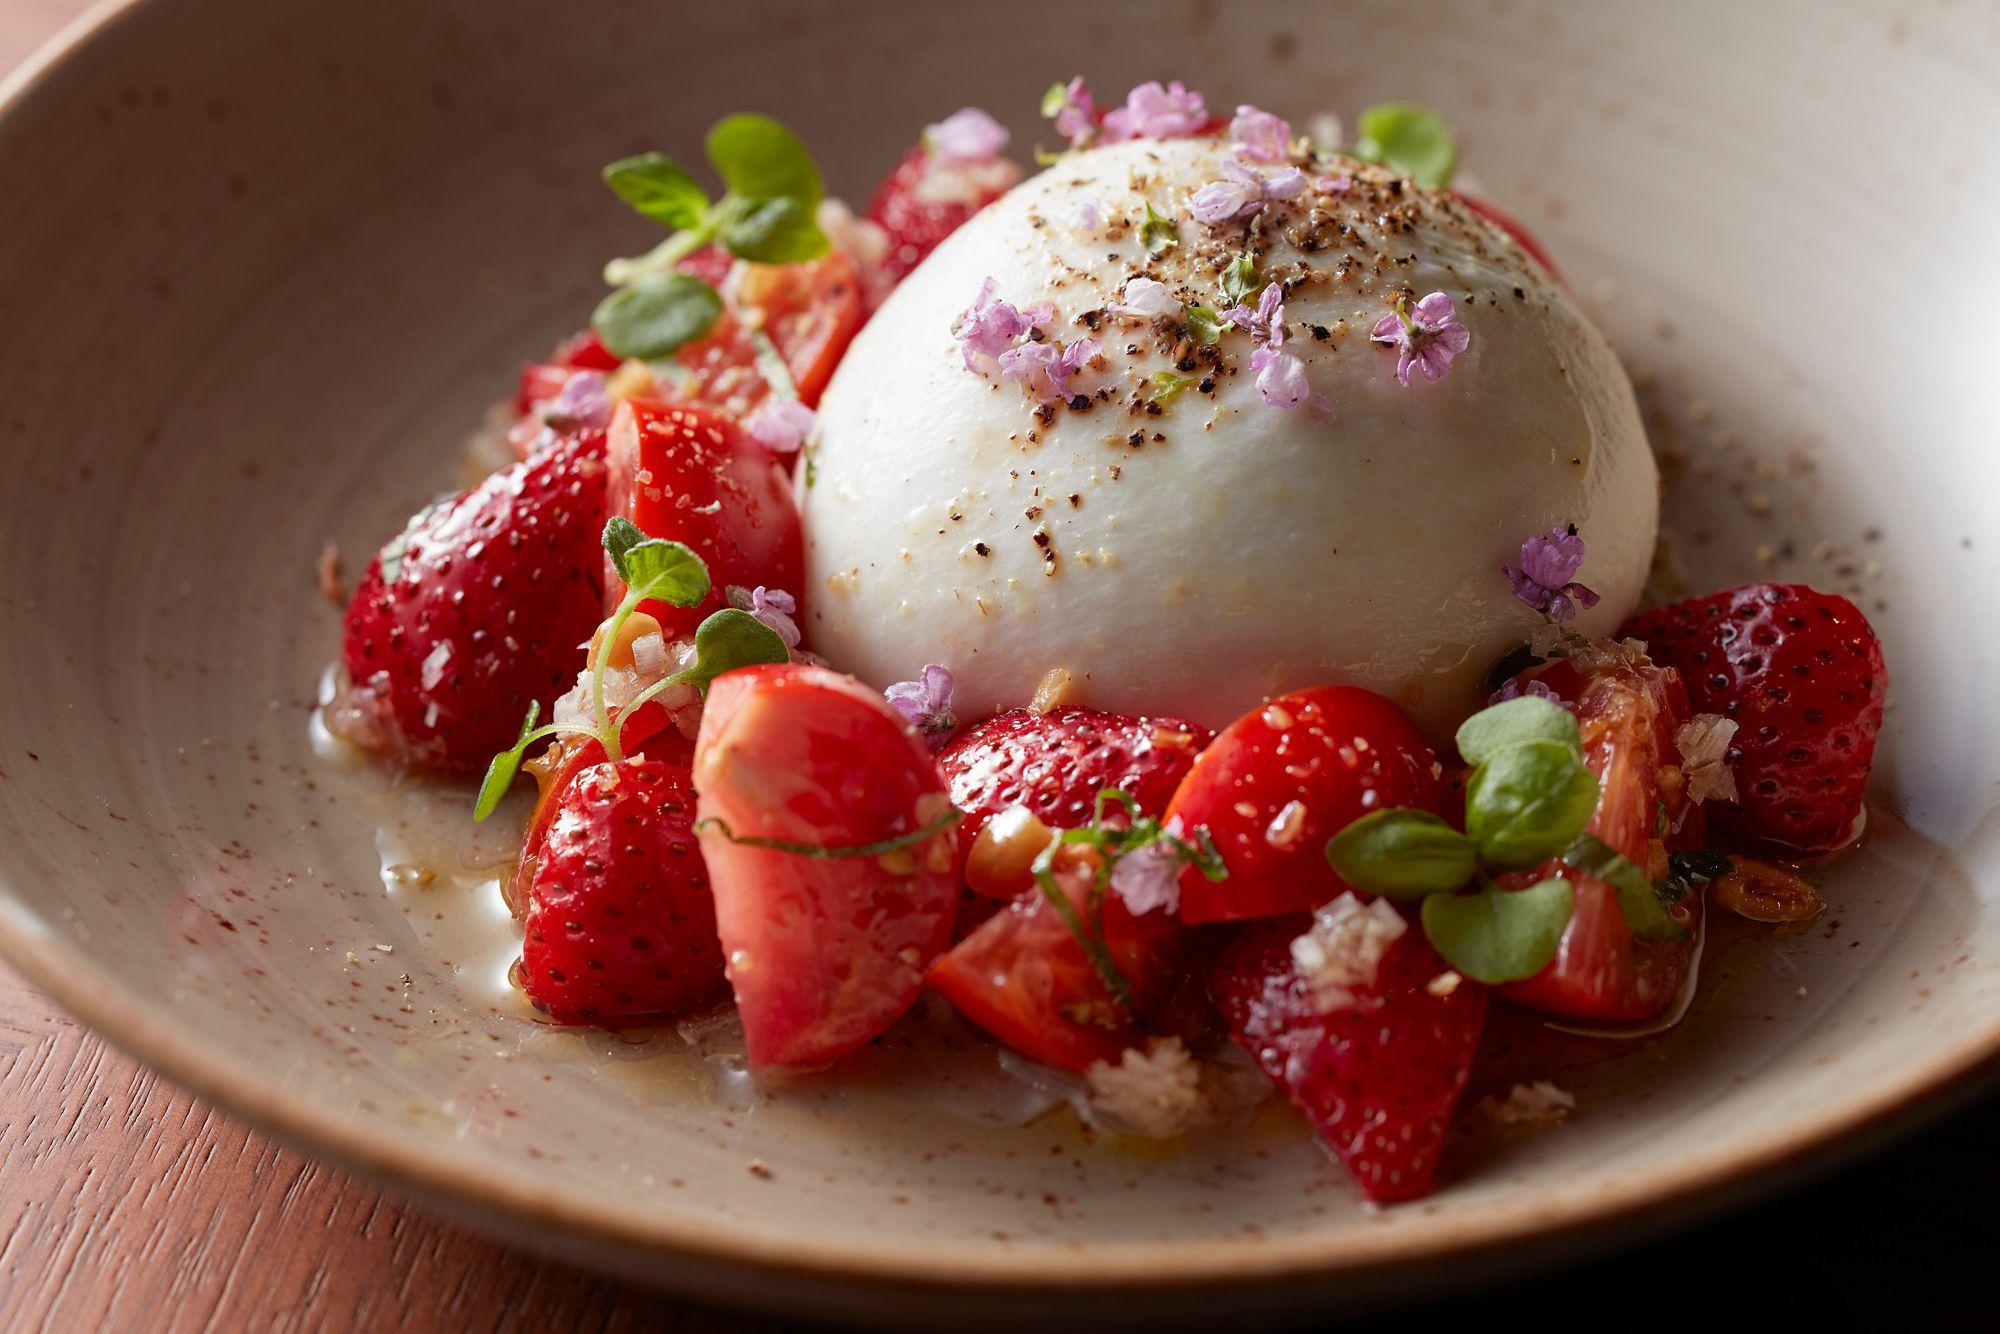 Strawberry and Tomato